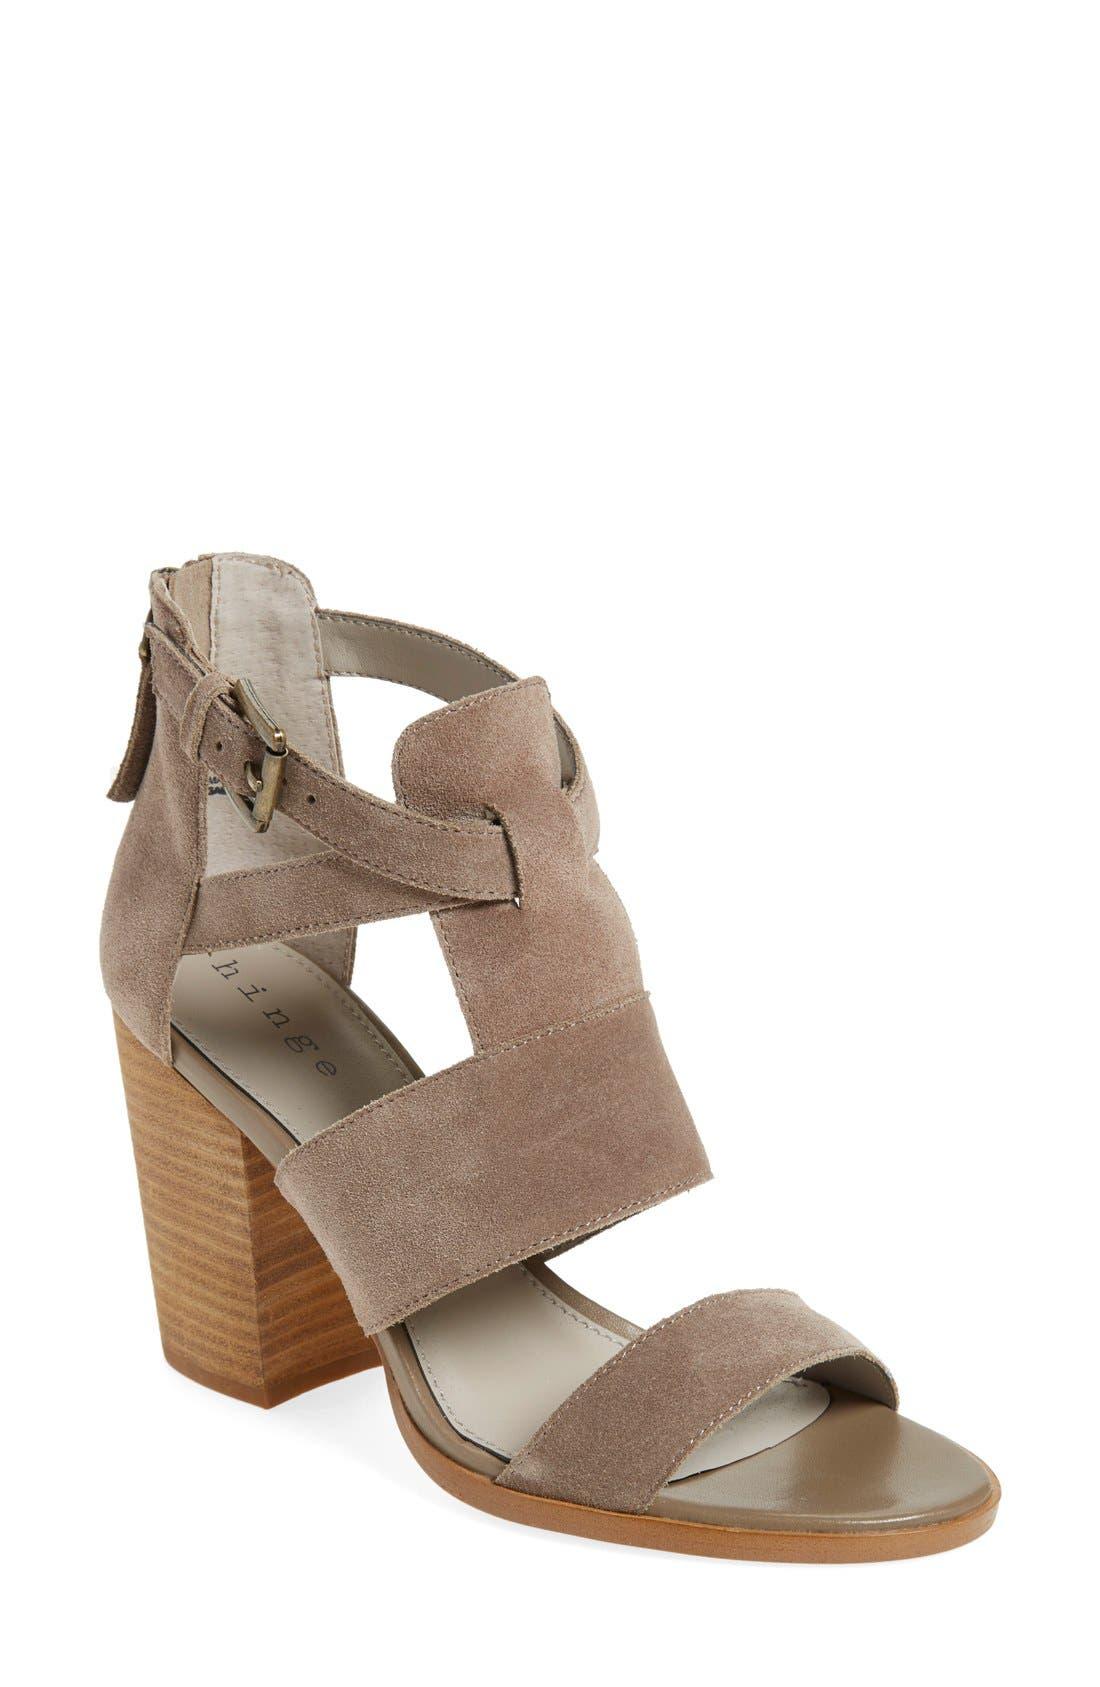 Alternate Image 1 Selected - Hinge 'Cora' Block Heel Sandal (Women)